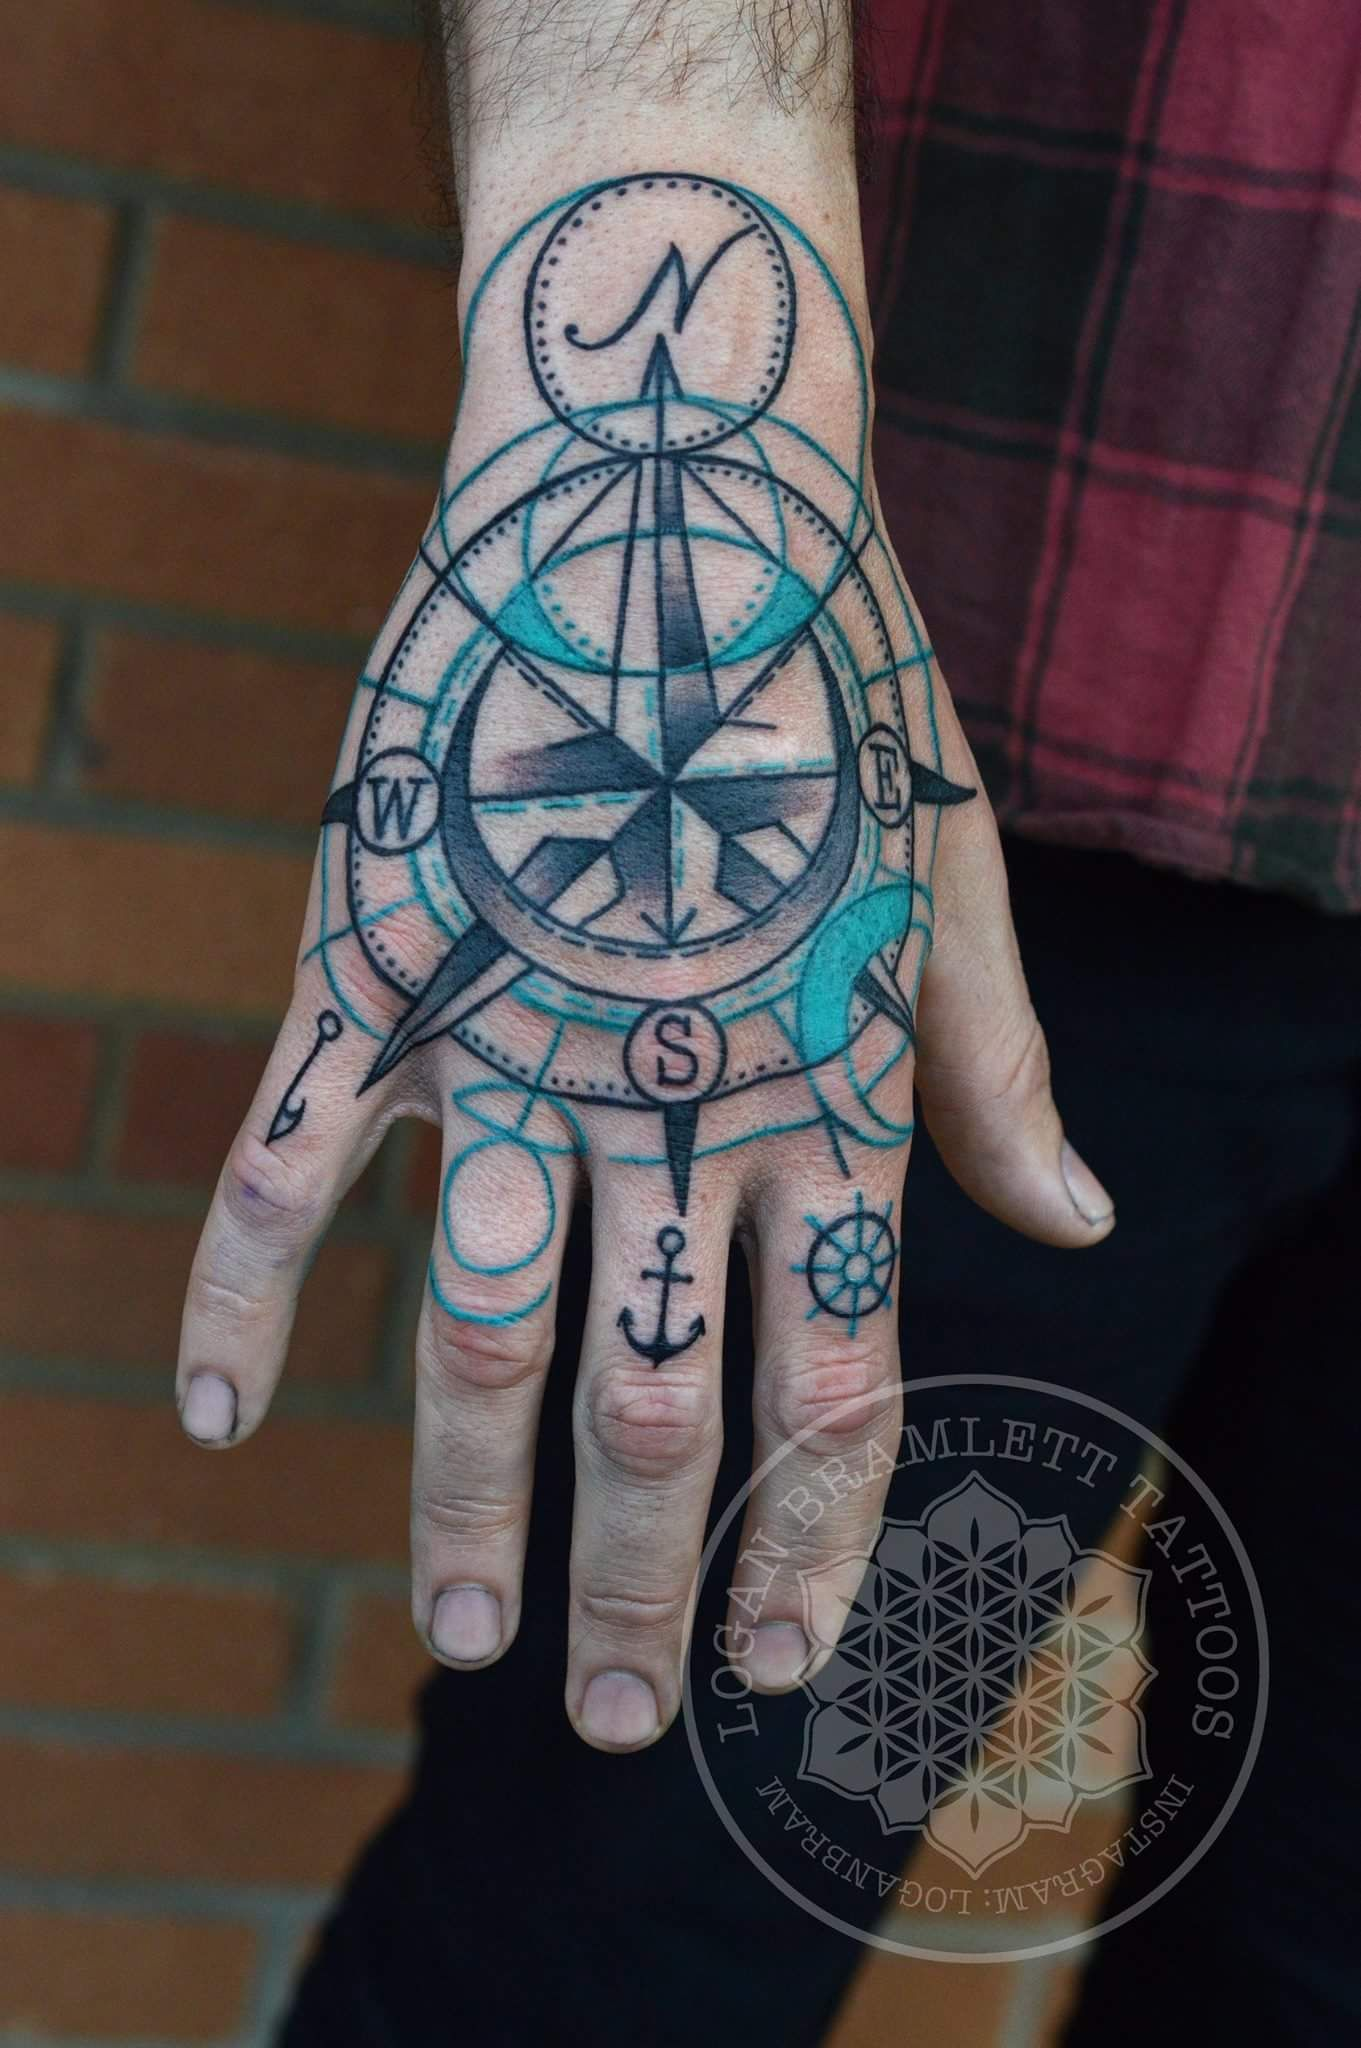 Abstract Stylized Compass By Me Logan Bramlett Wanderlust Tattoo Society Akron Ohio Compass Tattoo Tattoo Designs And Meanings Compass Tattoo Design